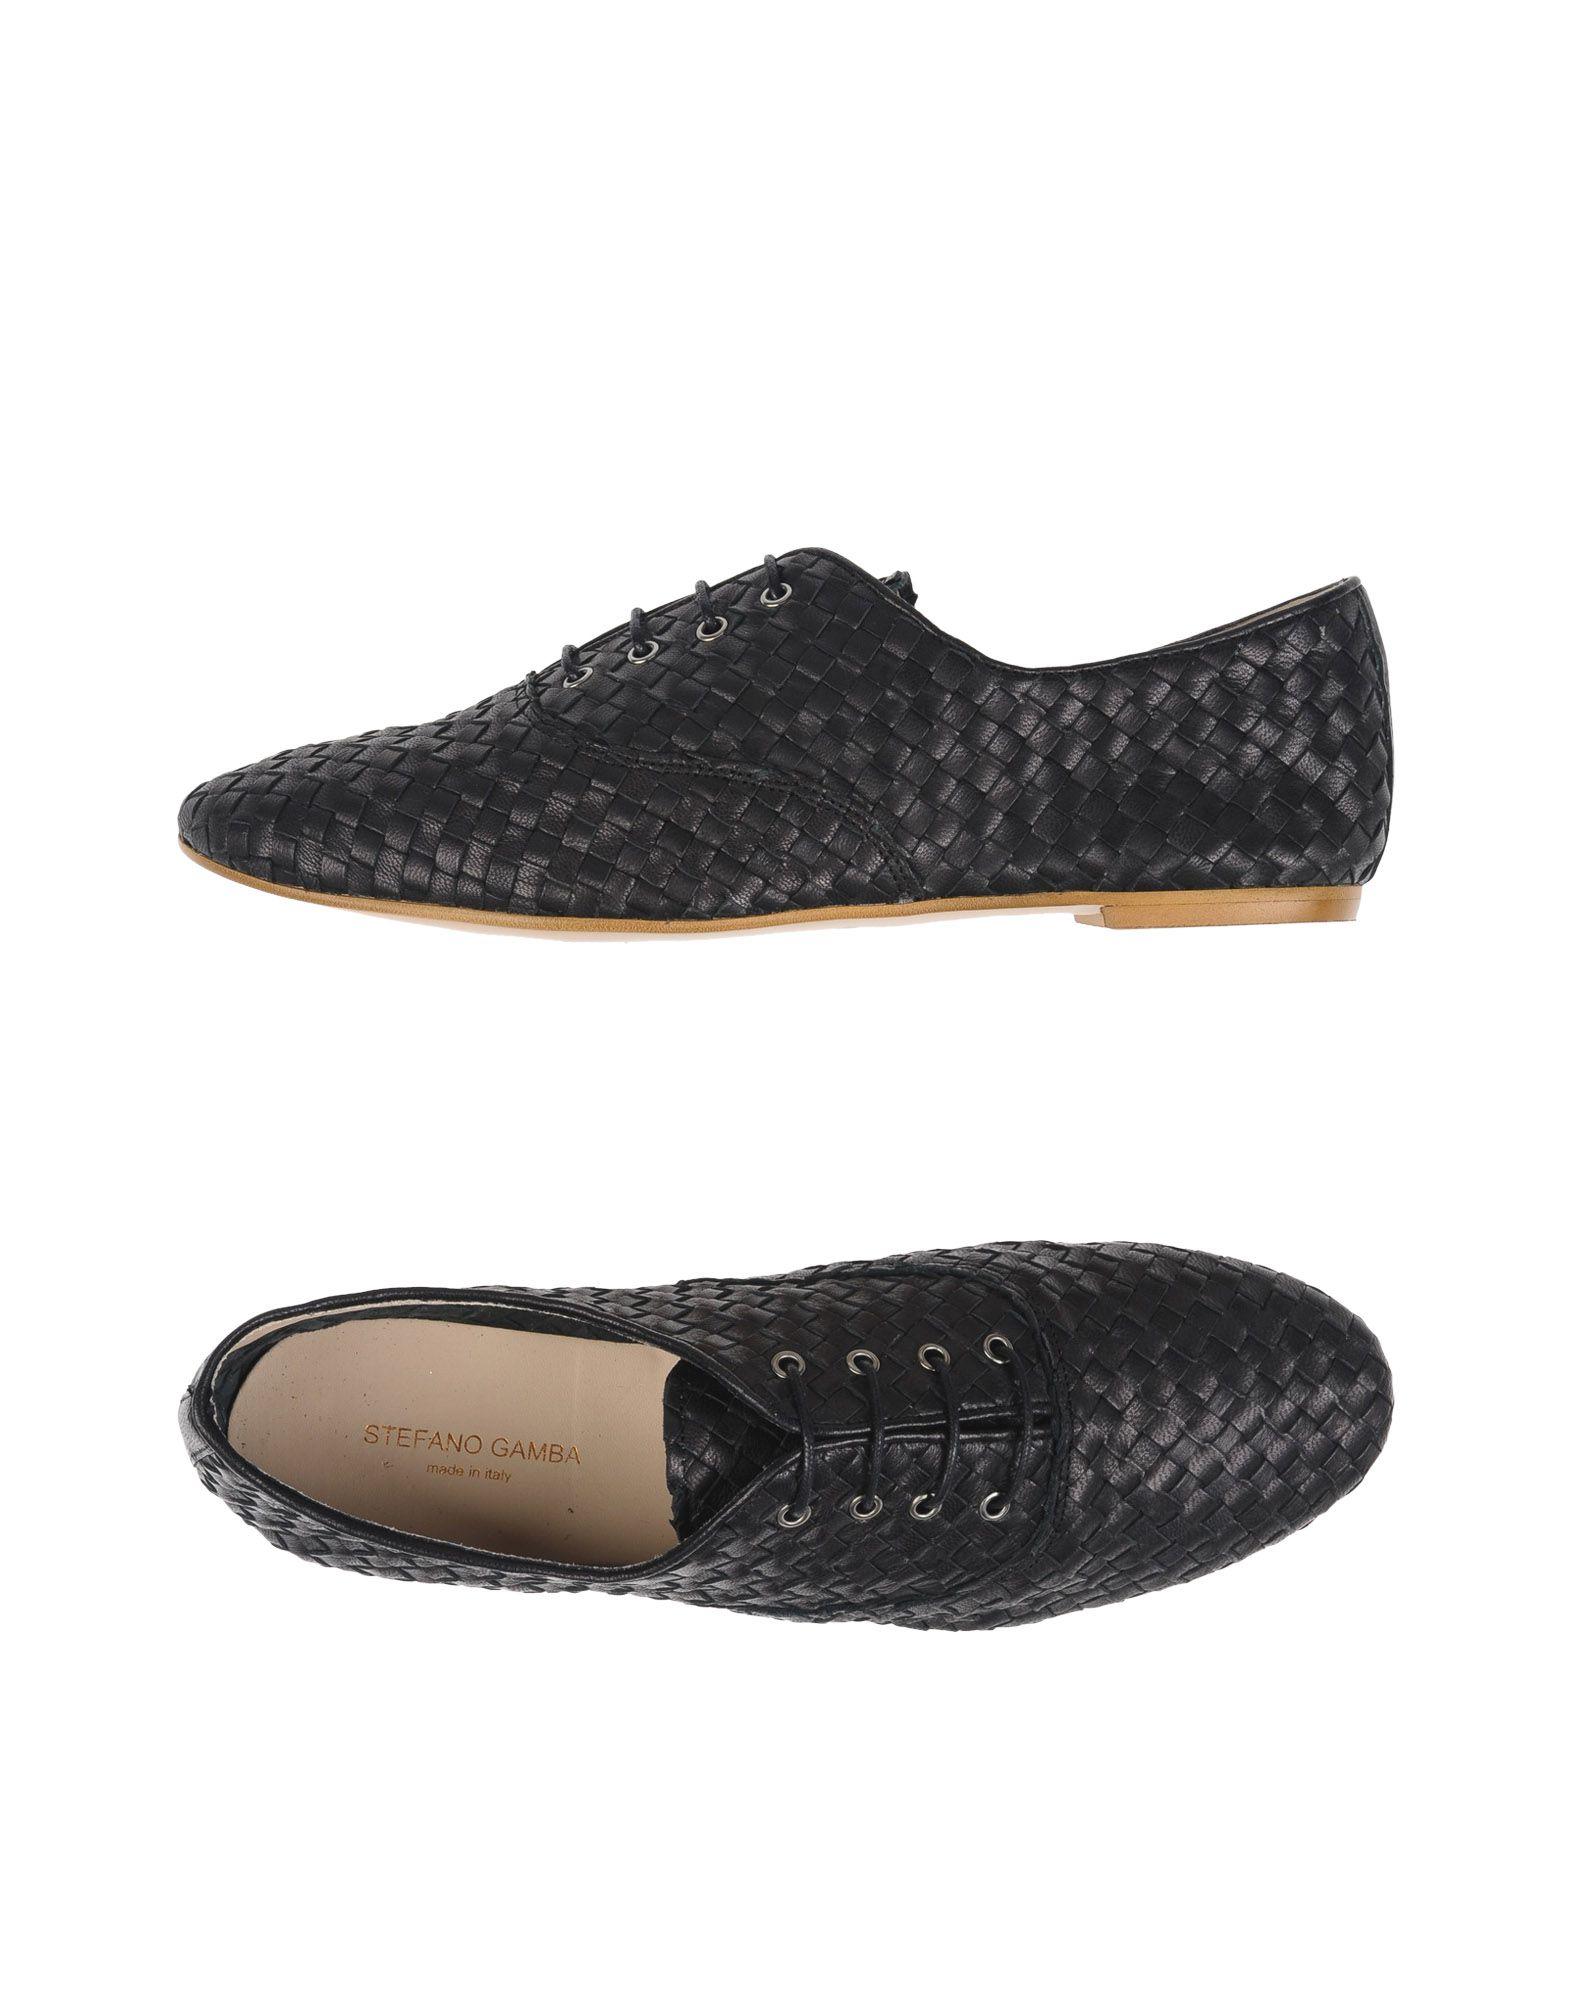 цены на STEFANO GAMBA Обувь на шнурках в интернет-магазинах